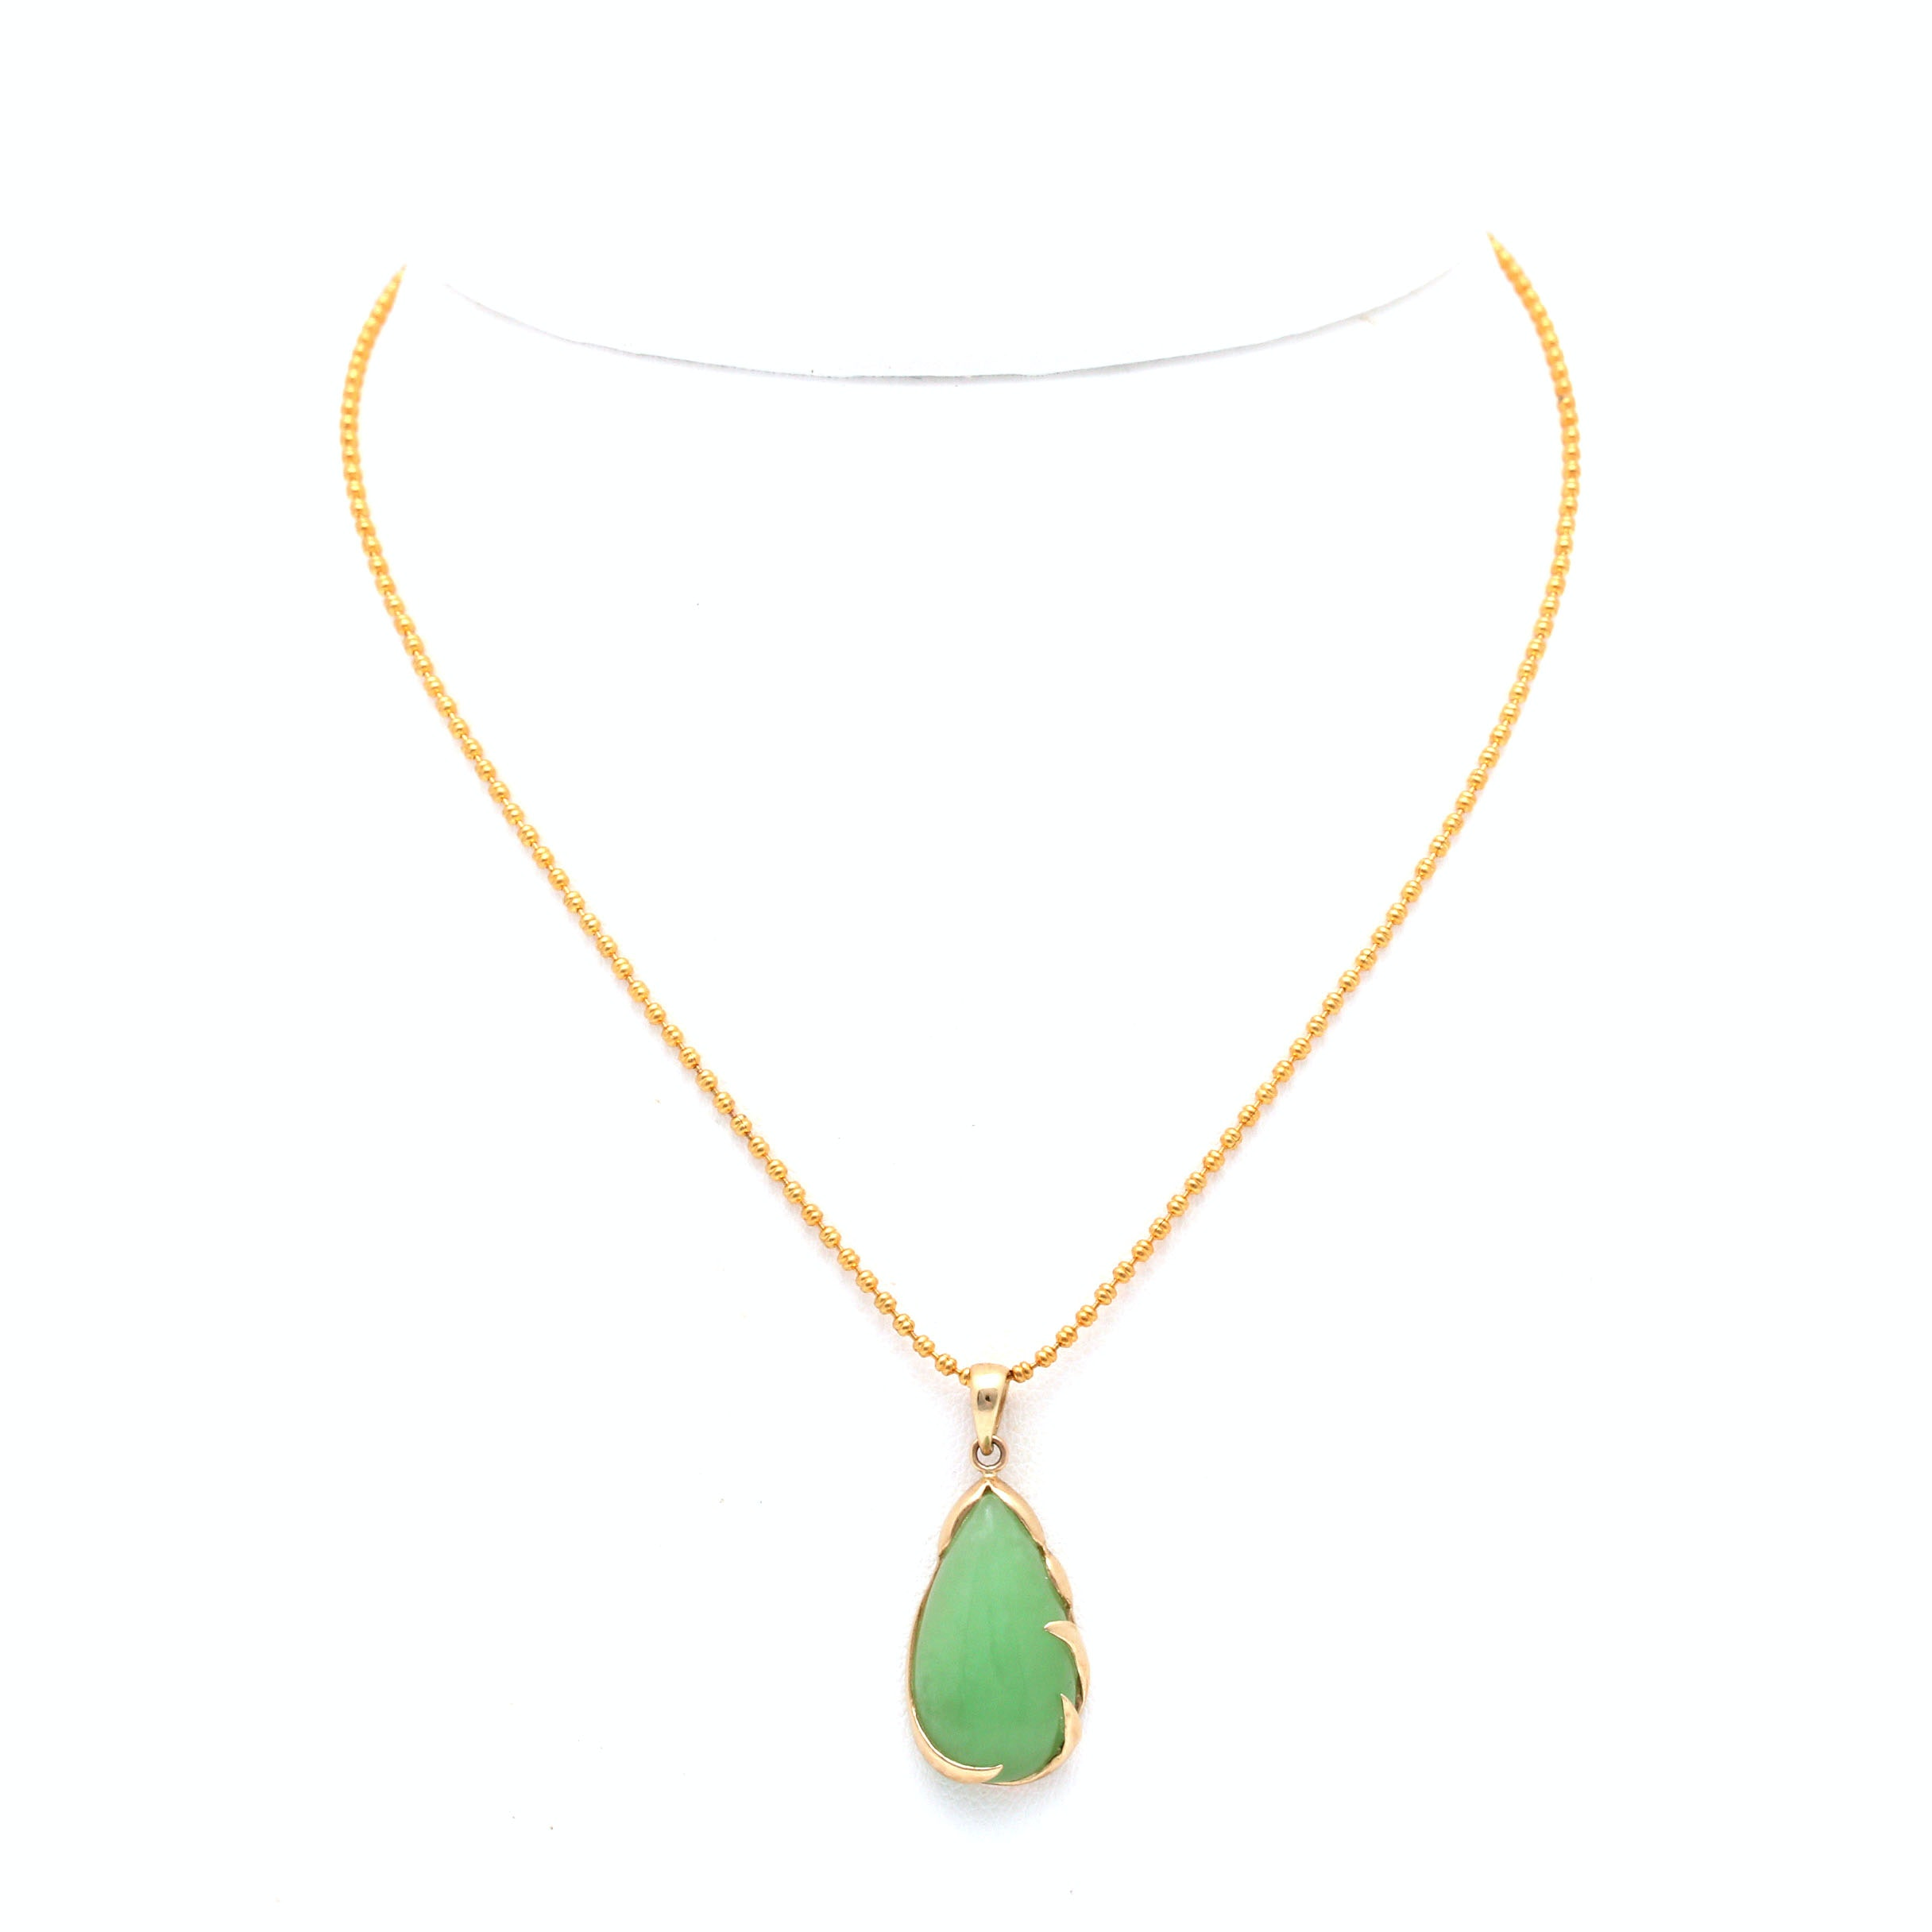 14K Yellow Gold Jadeite Pendant Necklace